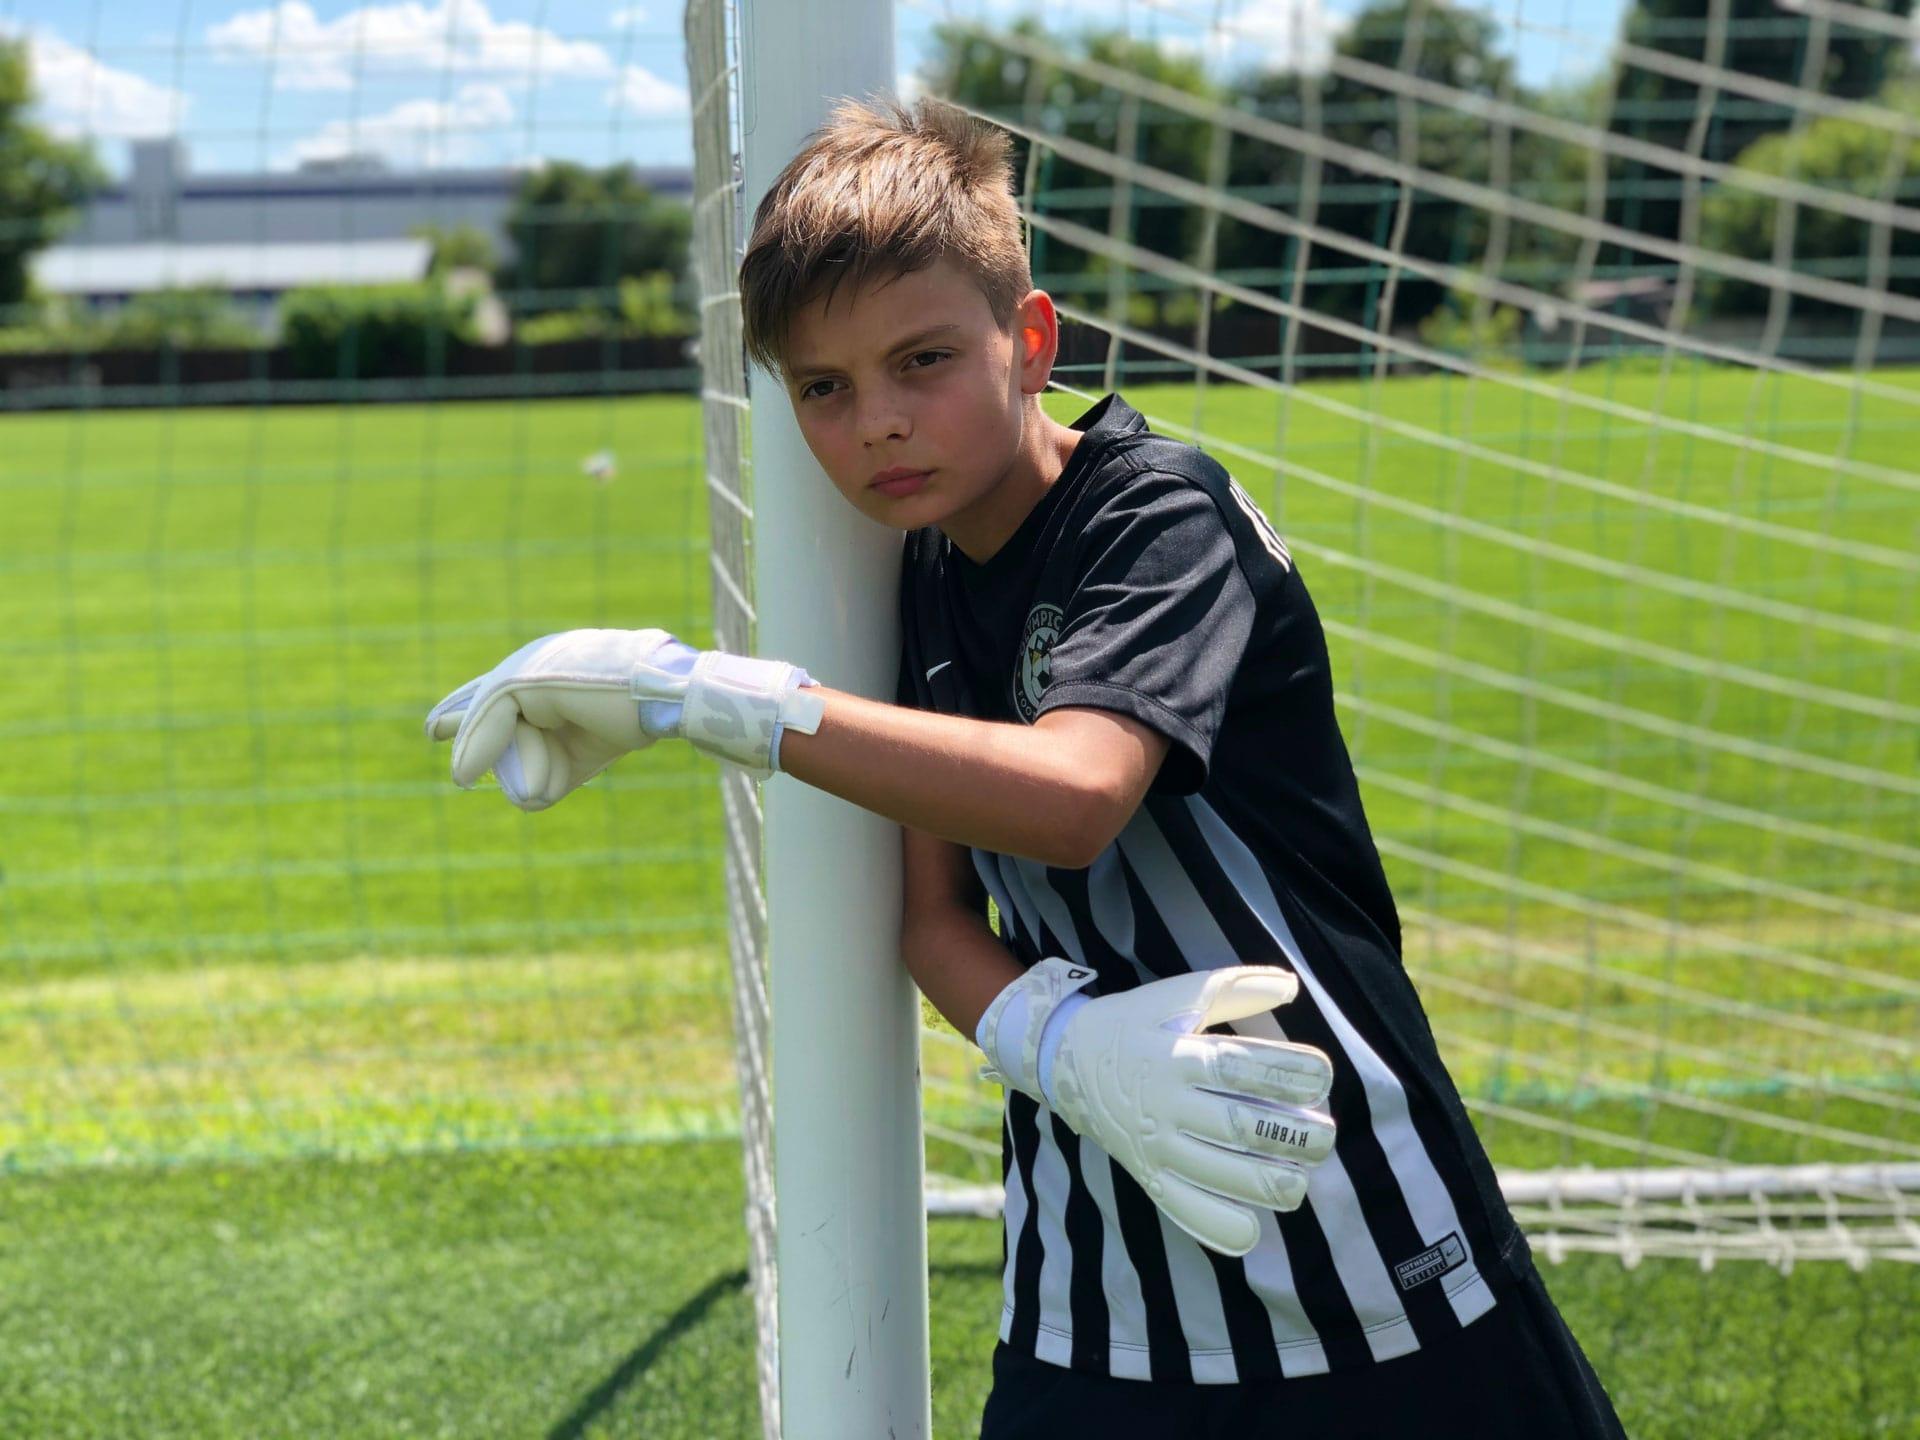 Children's goalkeeper gloves Brave REFLEX RF NEGATIVE official online store Brave GK